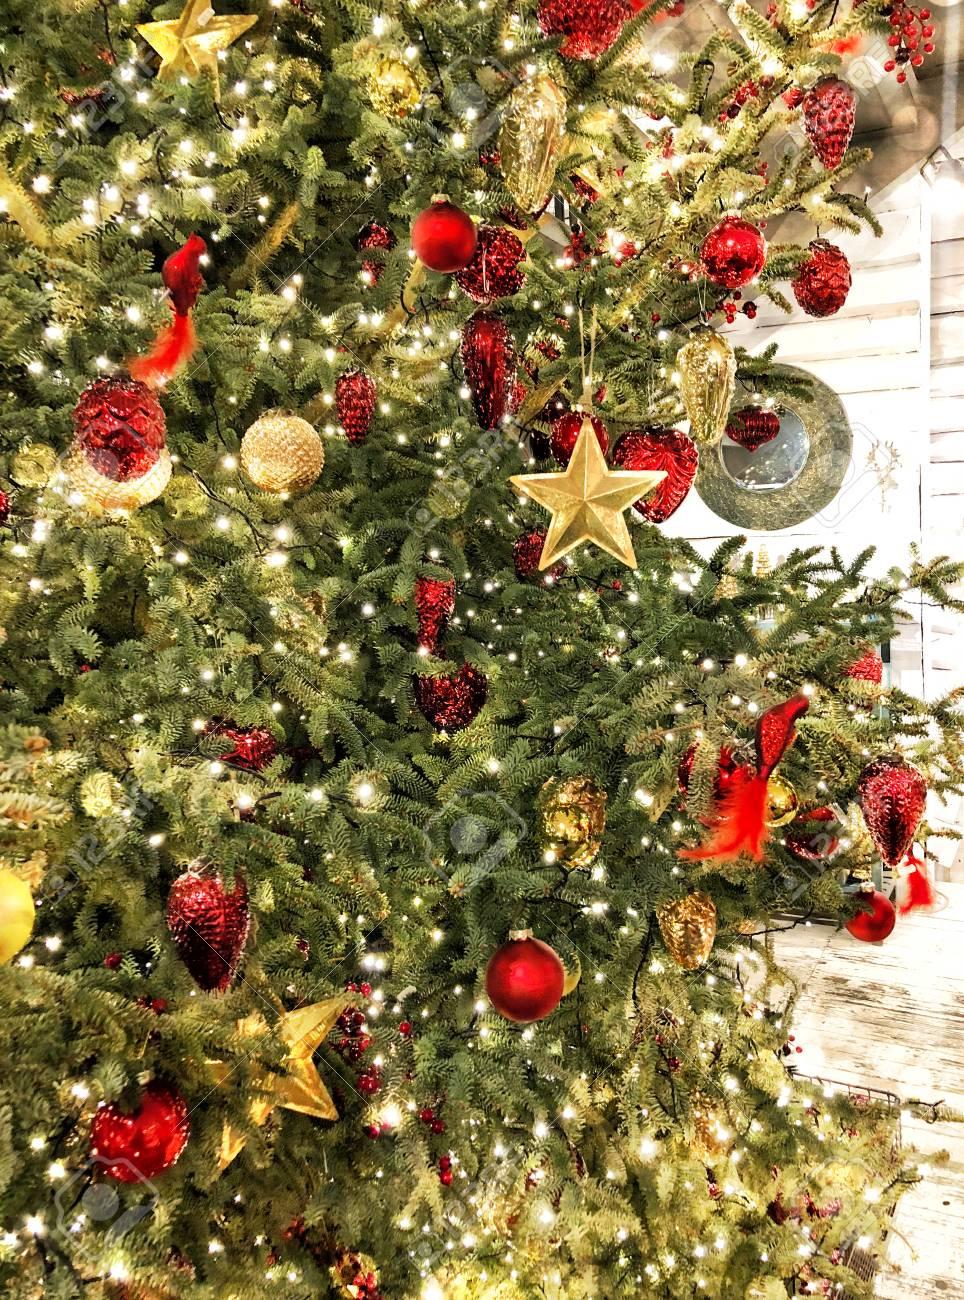 Vintage Style Christmas Ornaments.Christmas Tree Decoration Baubles Stars Ornaments Lights Vintage